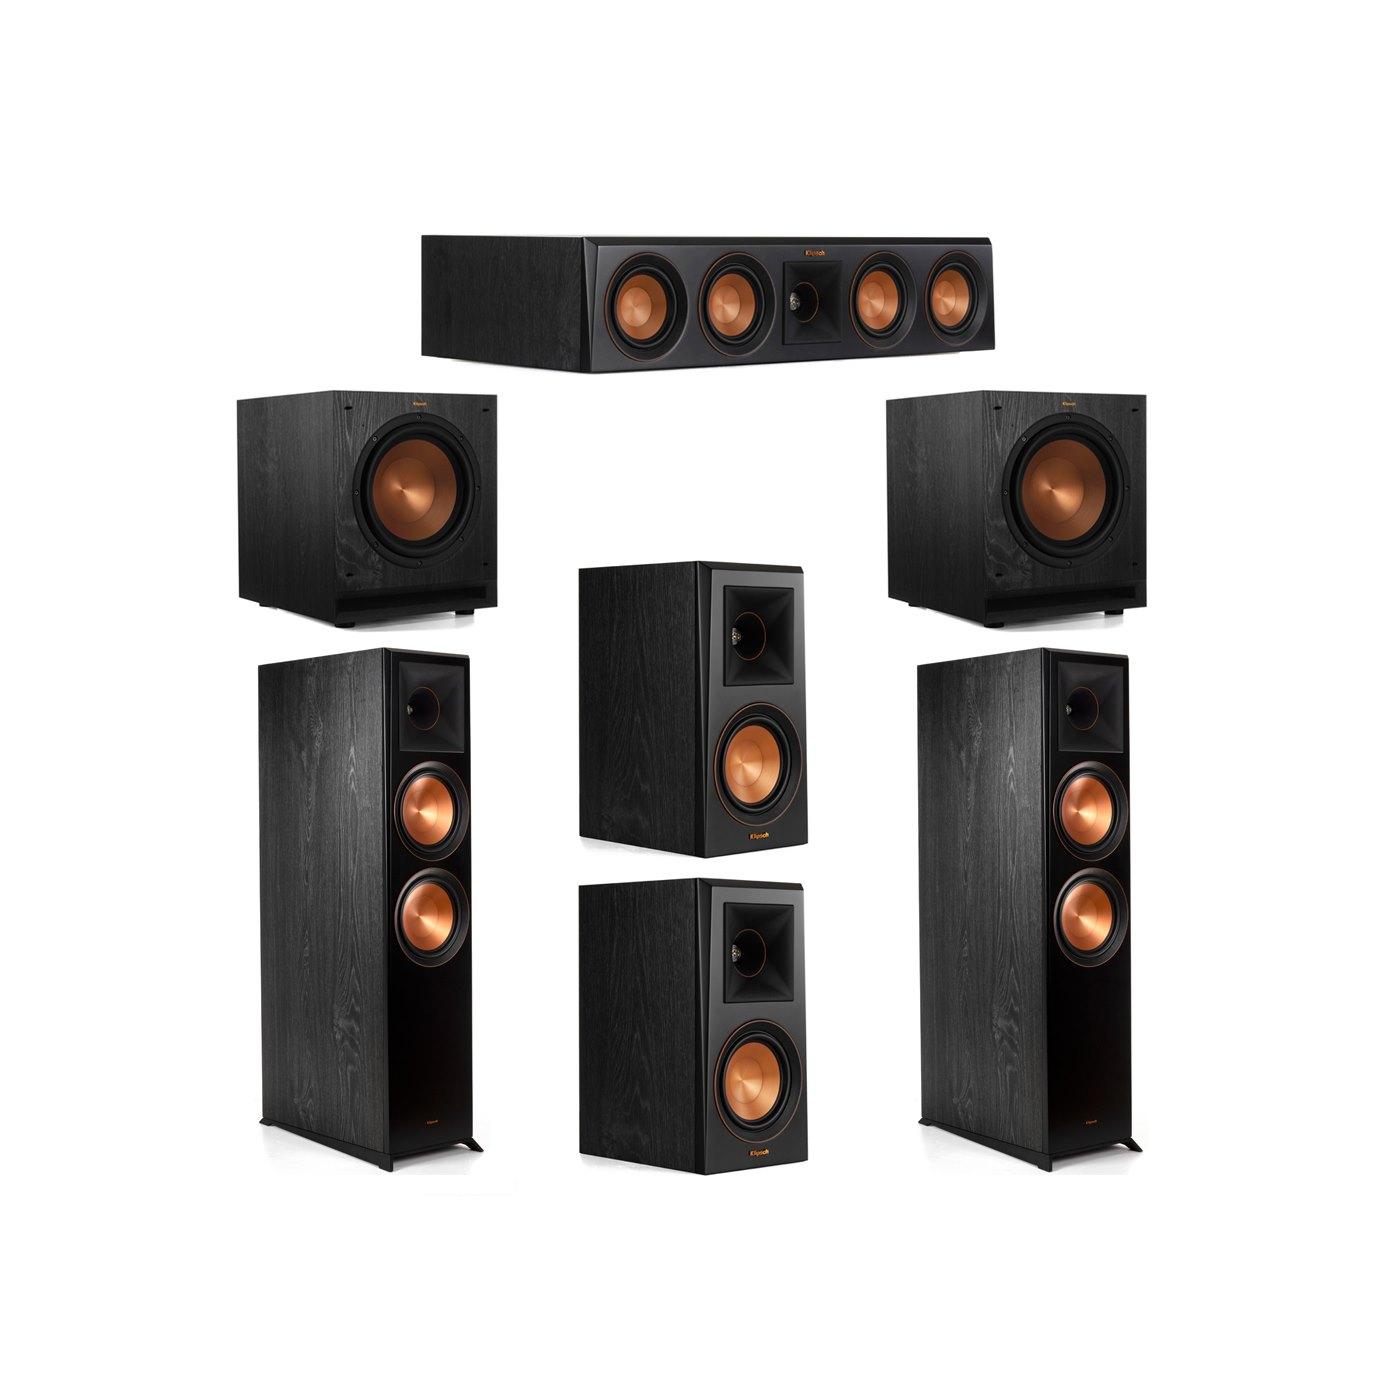 Klipsch 5.2 System with 2 RP-8000F Floorstanding Speakers, 1 Klipsch RP-404C Center Speaker, 2 Klipsch RP-500M Surround Speakers, 2 Klipsch SPL-100 Subwoofers